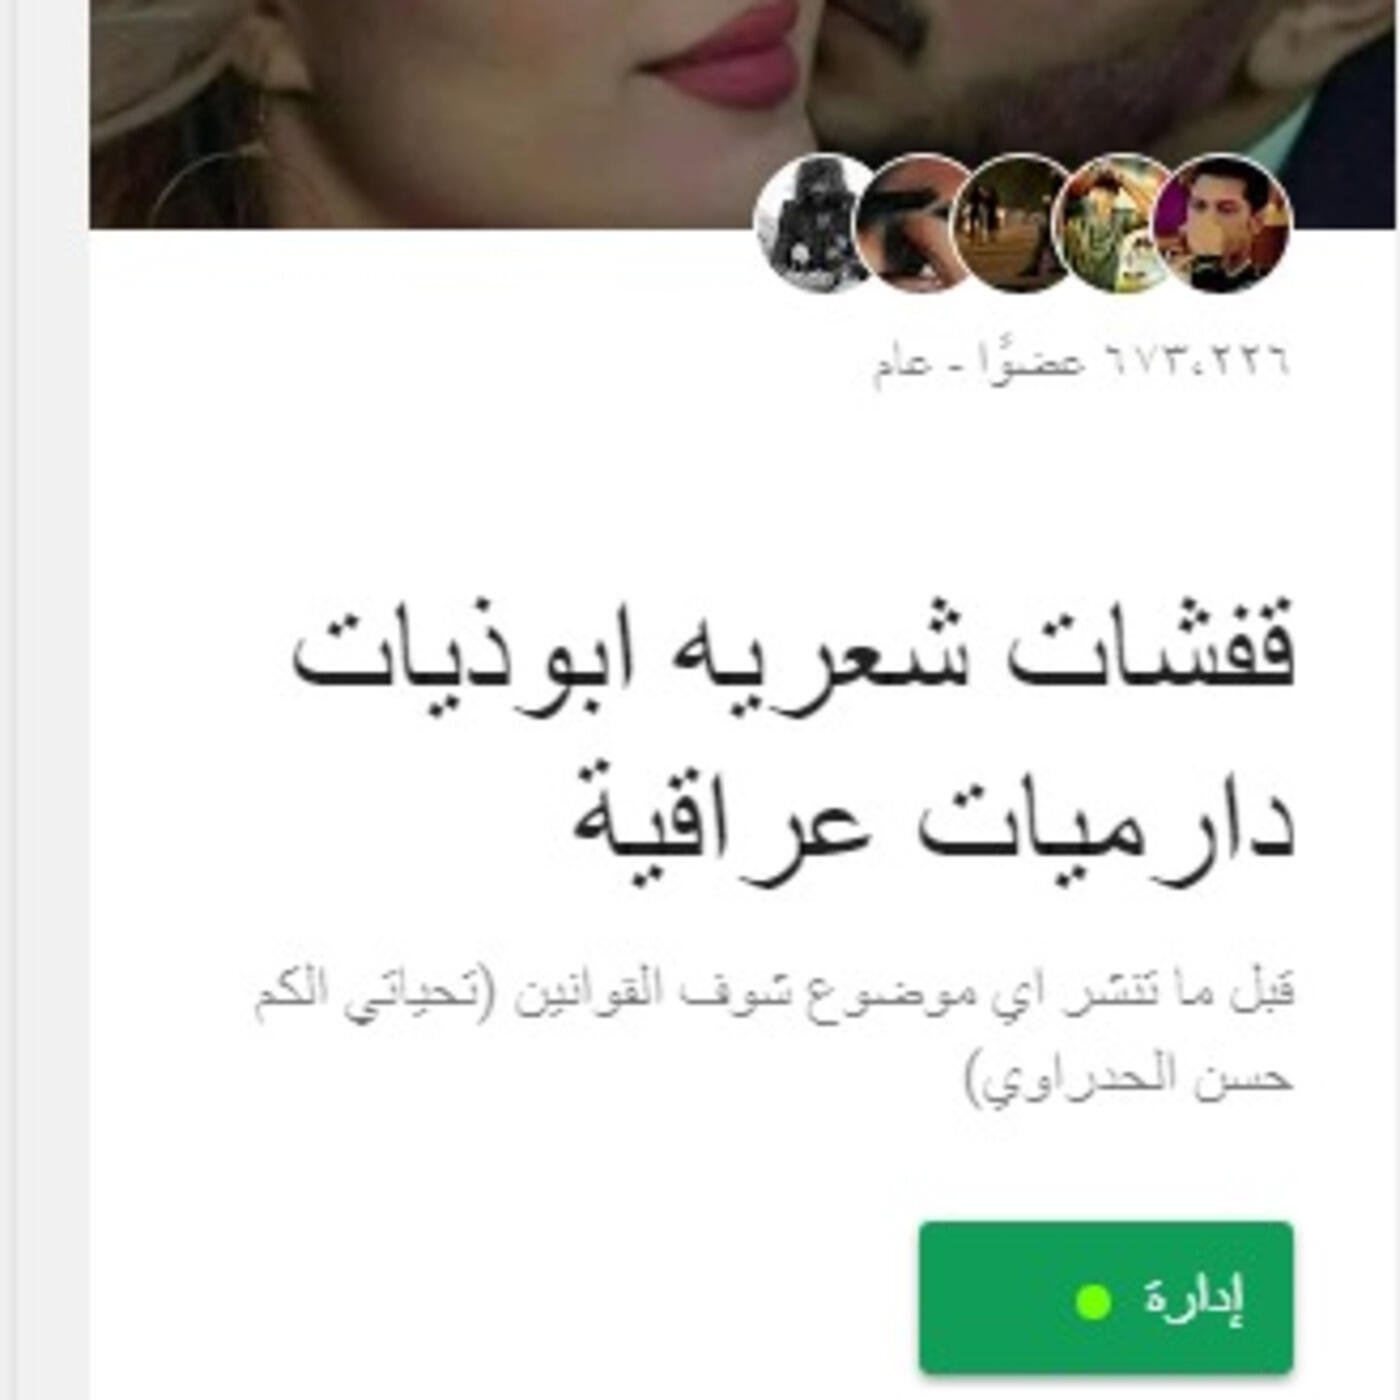 شعر حب وغزل دارمي عراقي Shaer Blog